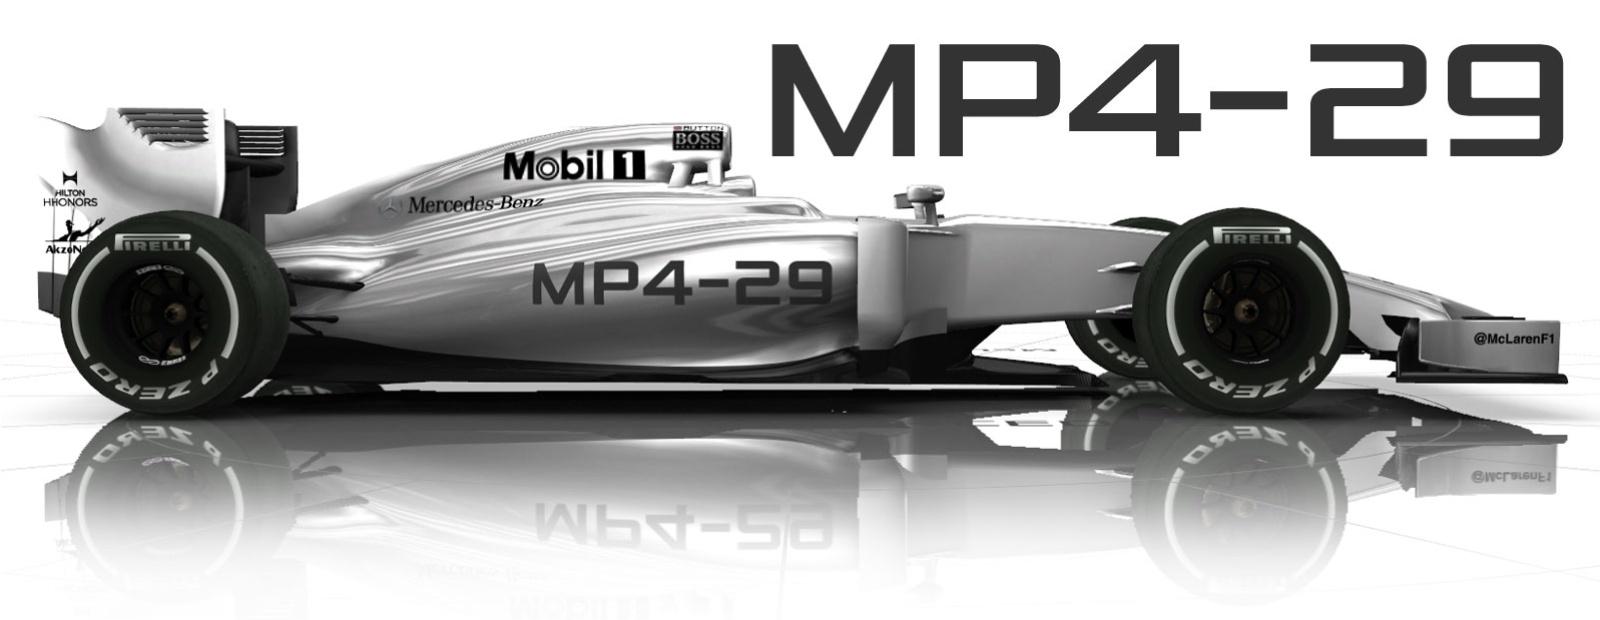 mclaren formula 1 - racing impact: 2014 formula 1 regulation changes